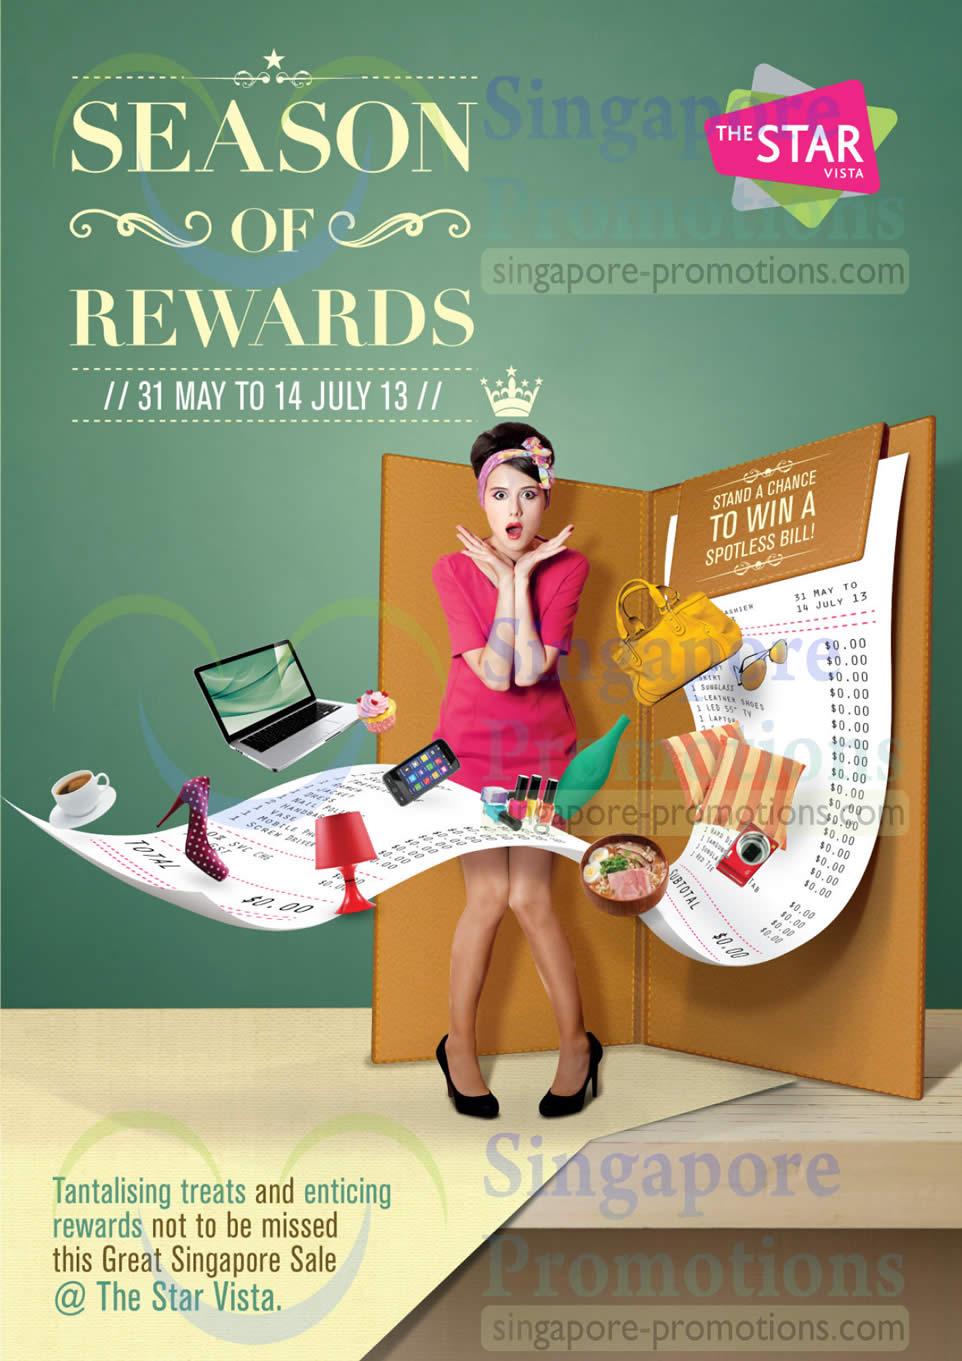 The Star Vista Season of Rewards